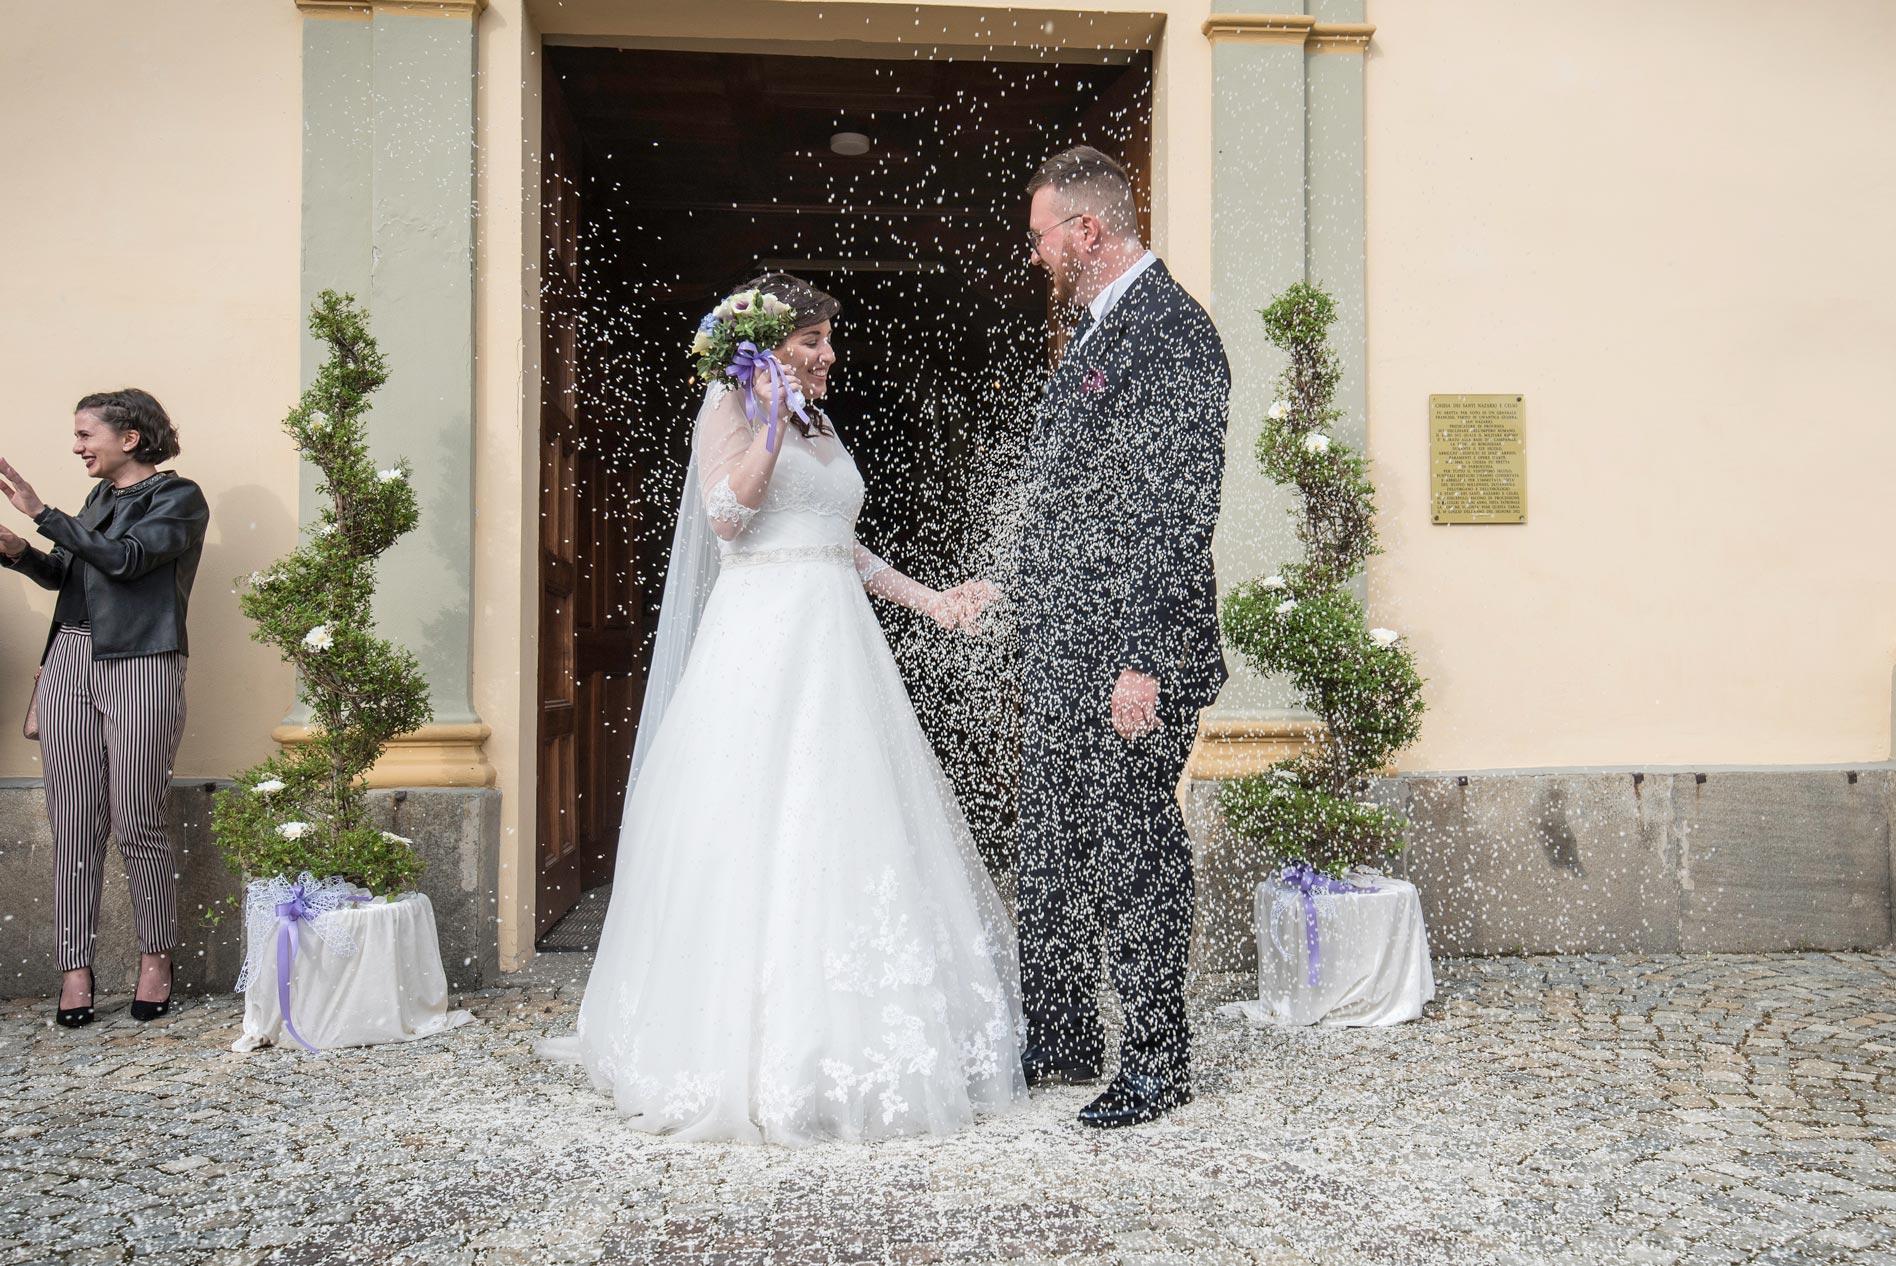 Matrimonio a Narzole Lorenza Diego - DSC 0602 - Foto matrimonio riso - Foto matrimonio riso